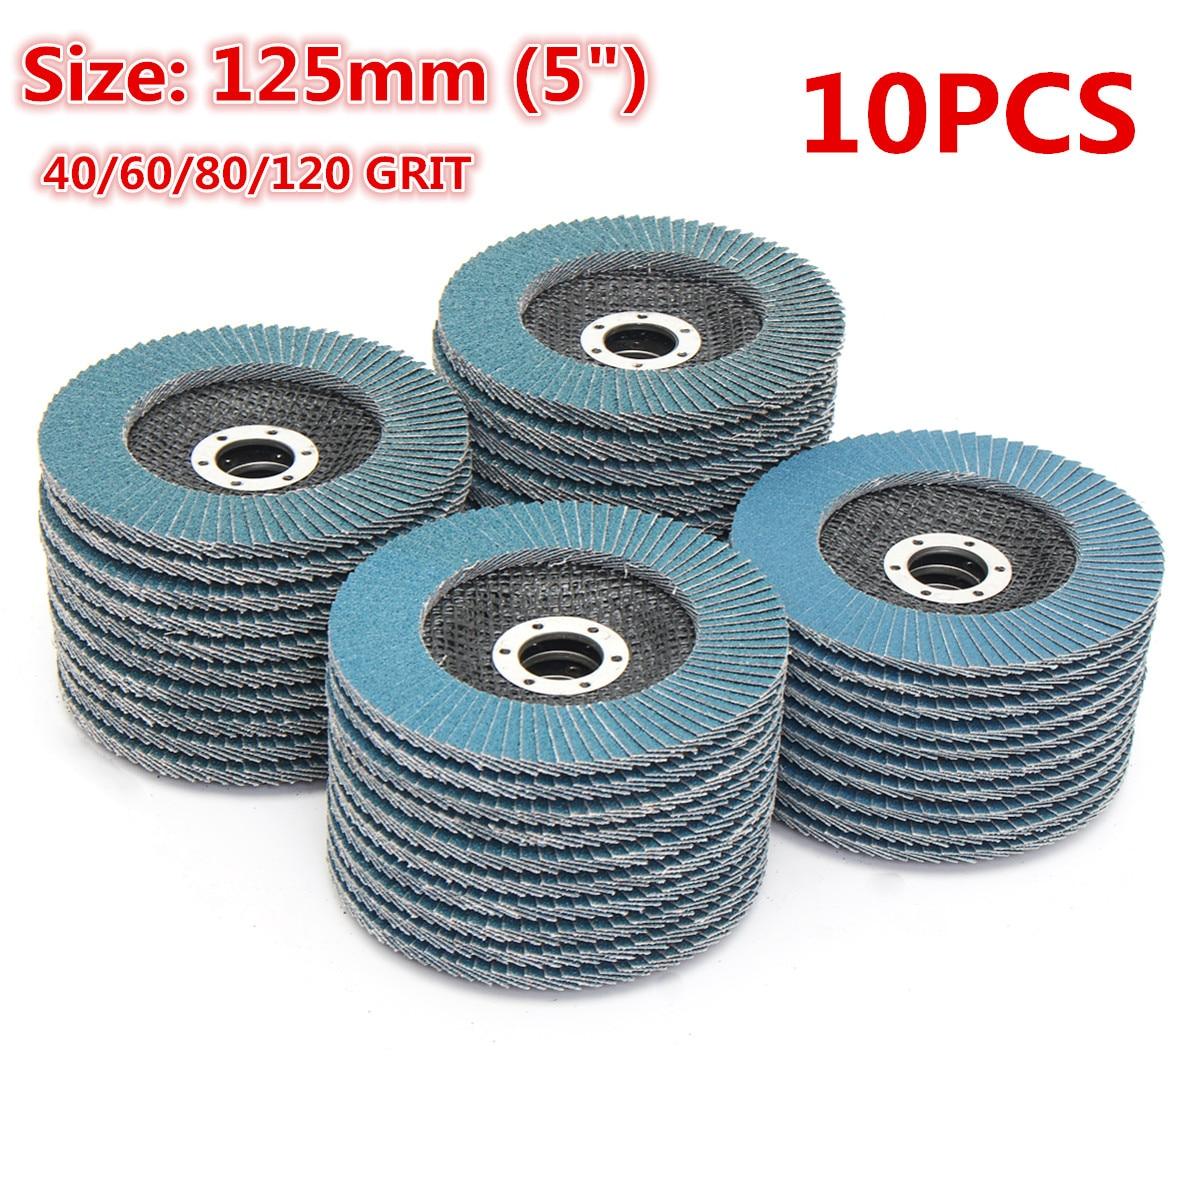 10Pcs Grinding Wheels Flap Discs 125mm 40/60/80/120 Grit Angle Grinder Sanding Discs Metal Plastic Wood Abrasive Tool A65